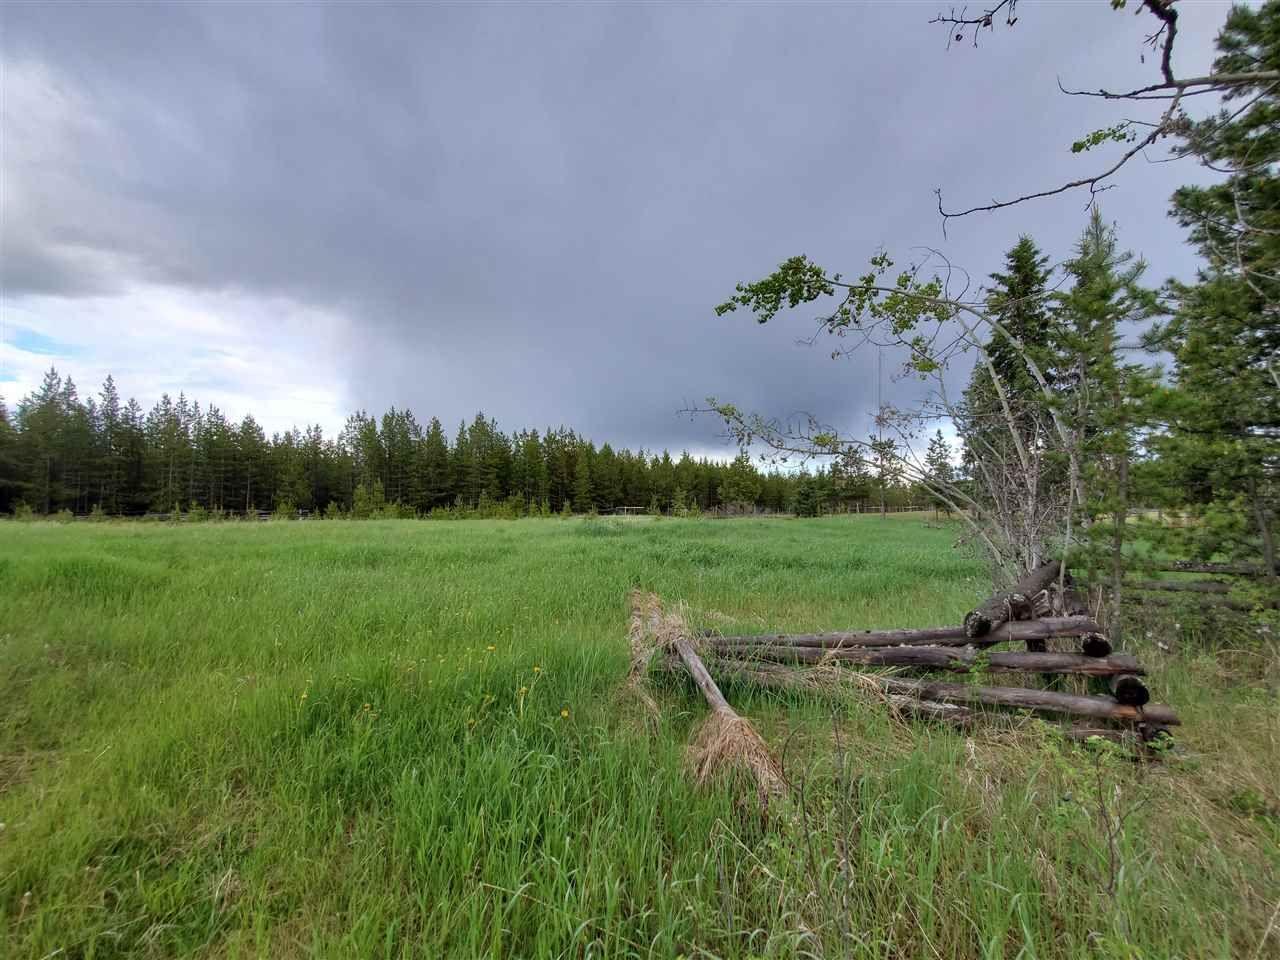 Photo 14: Photos: 9712 NAZKO Road: Bouchie Lake House for sale (Quesnel (Zone 28))  : MLS®# R2592064